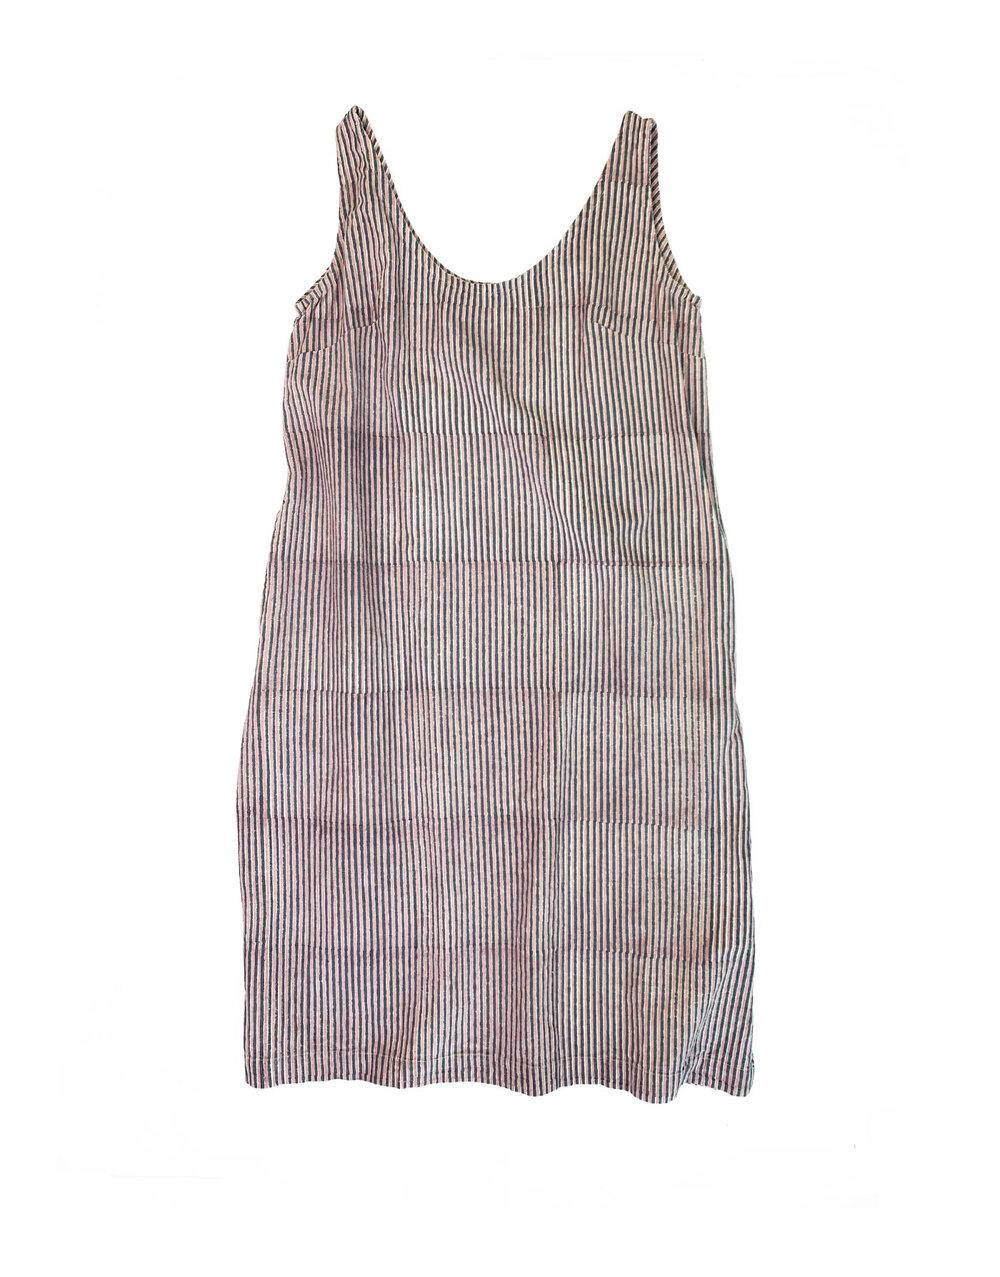 Maxi Dress in Block Stripe